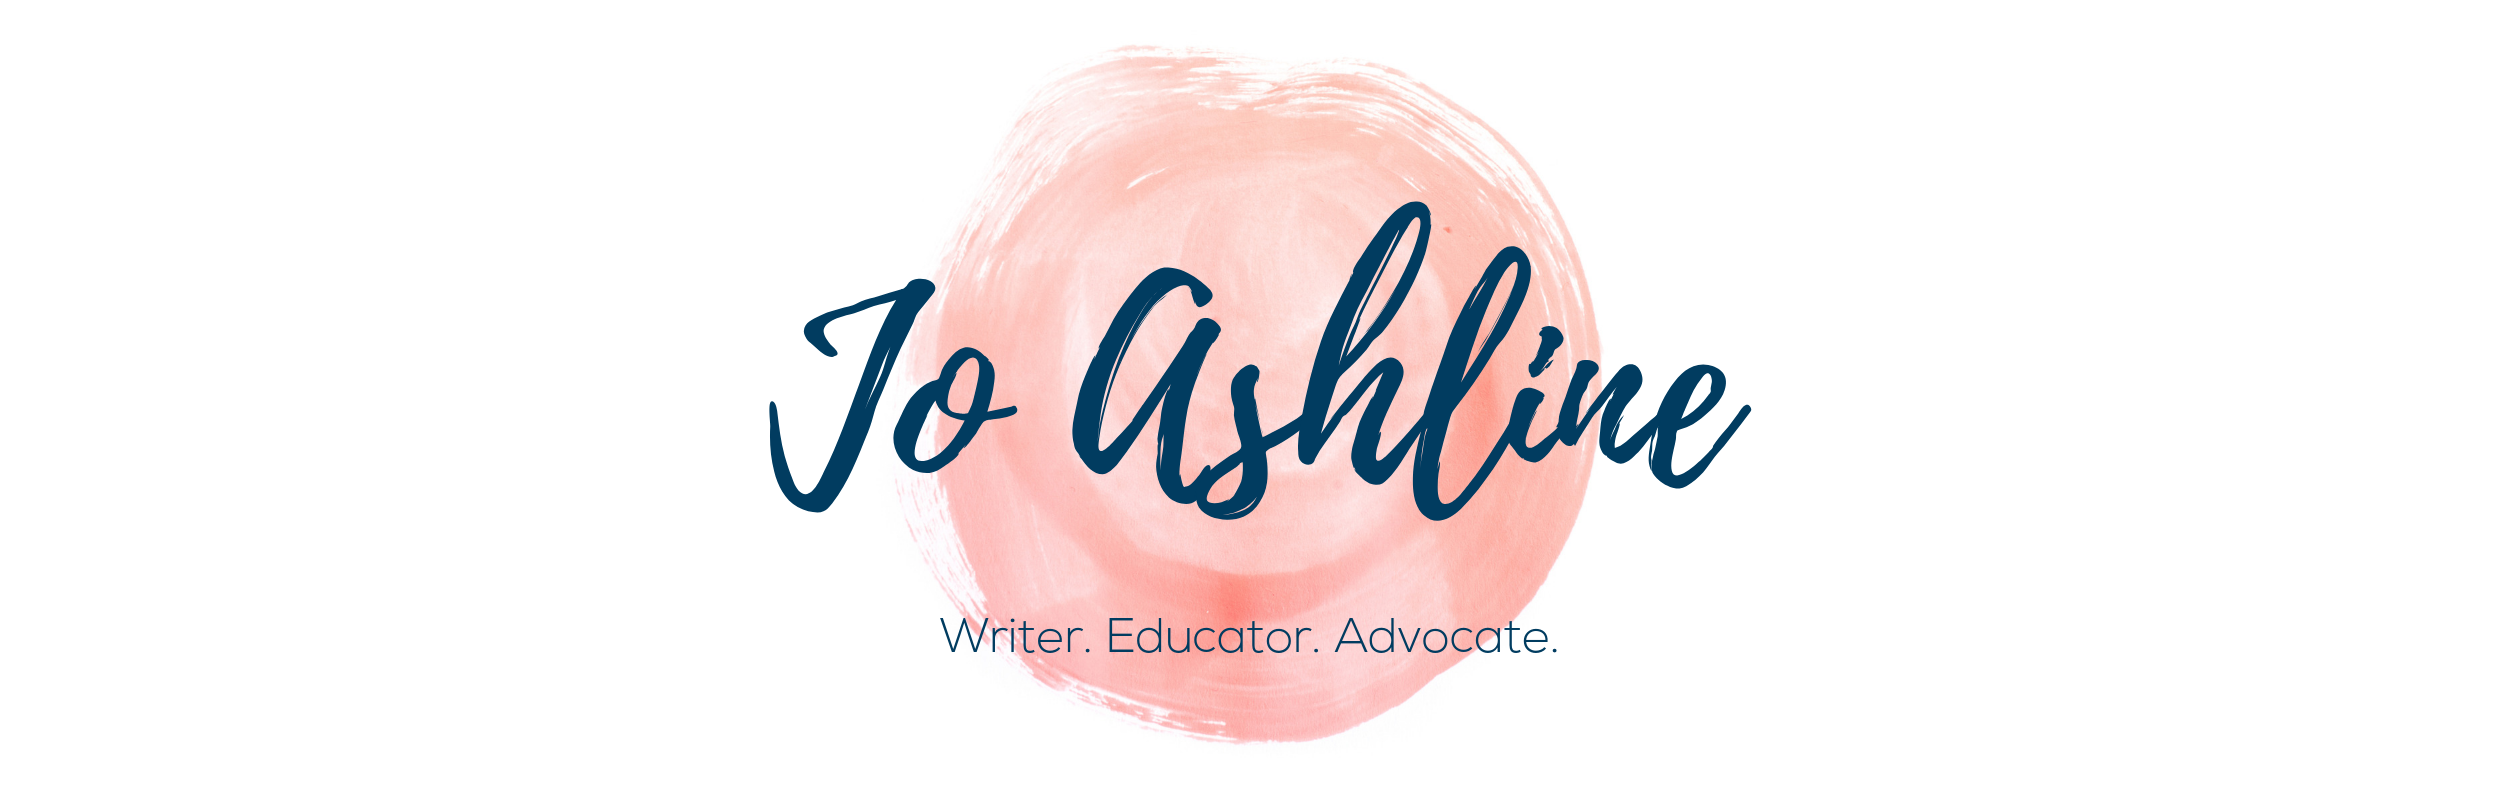 Jo Ashline